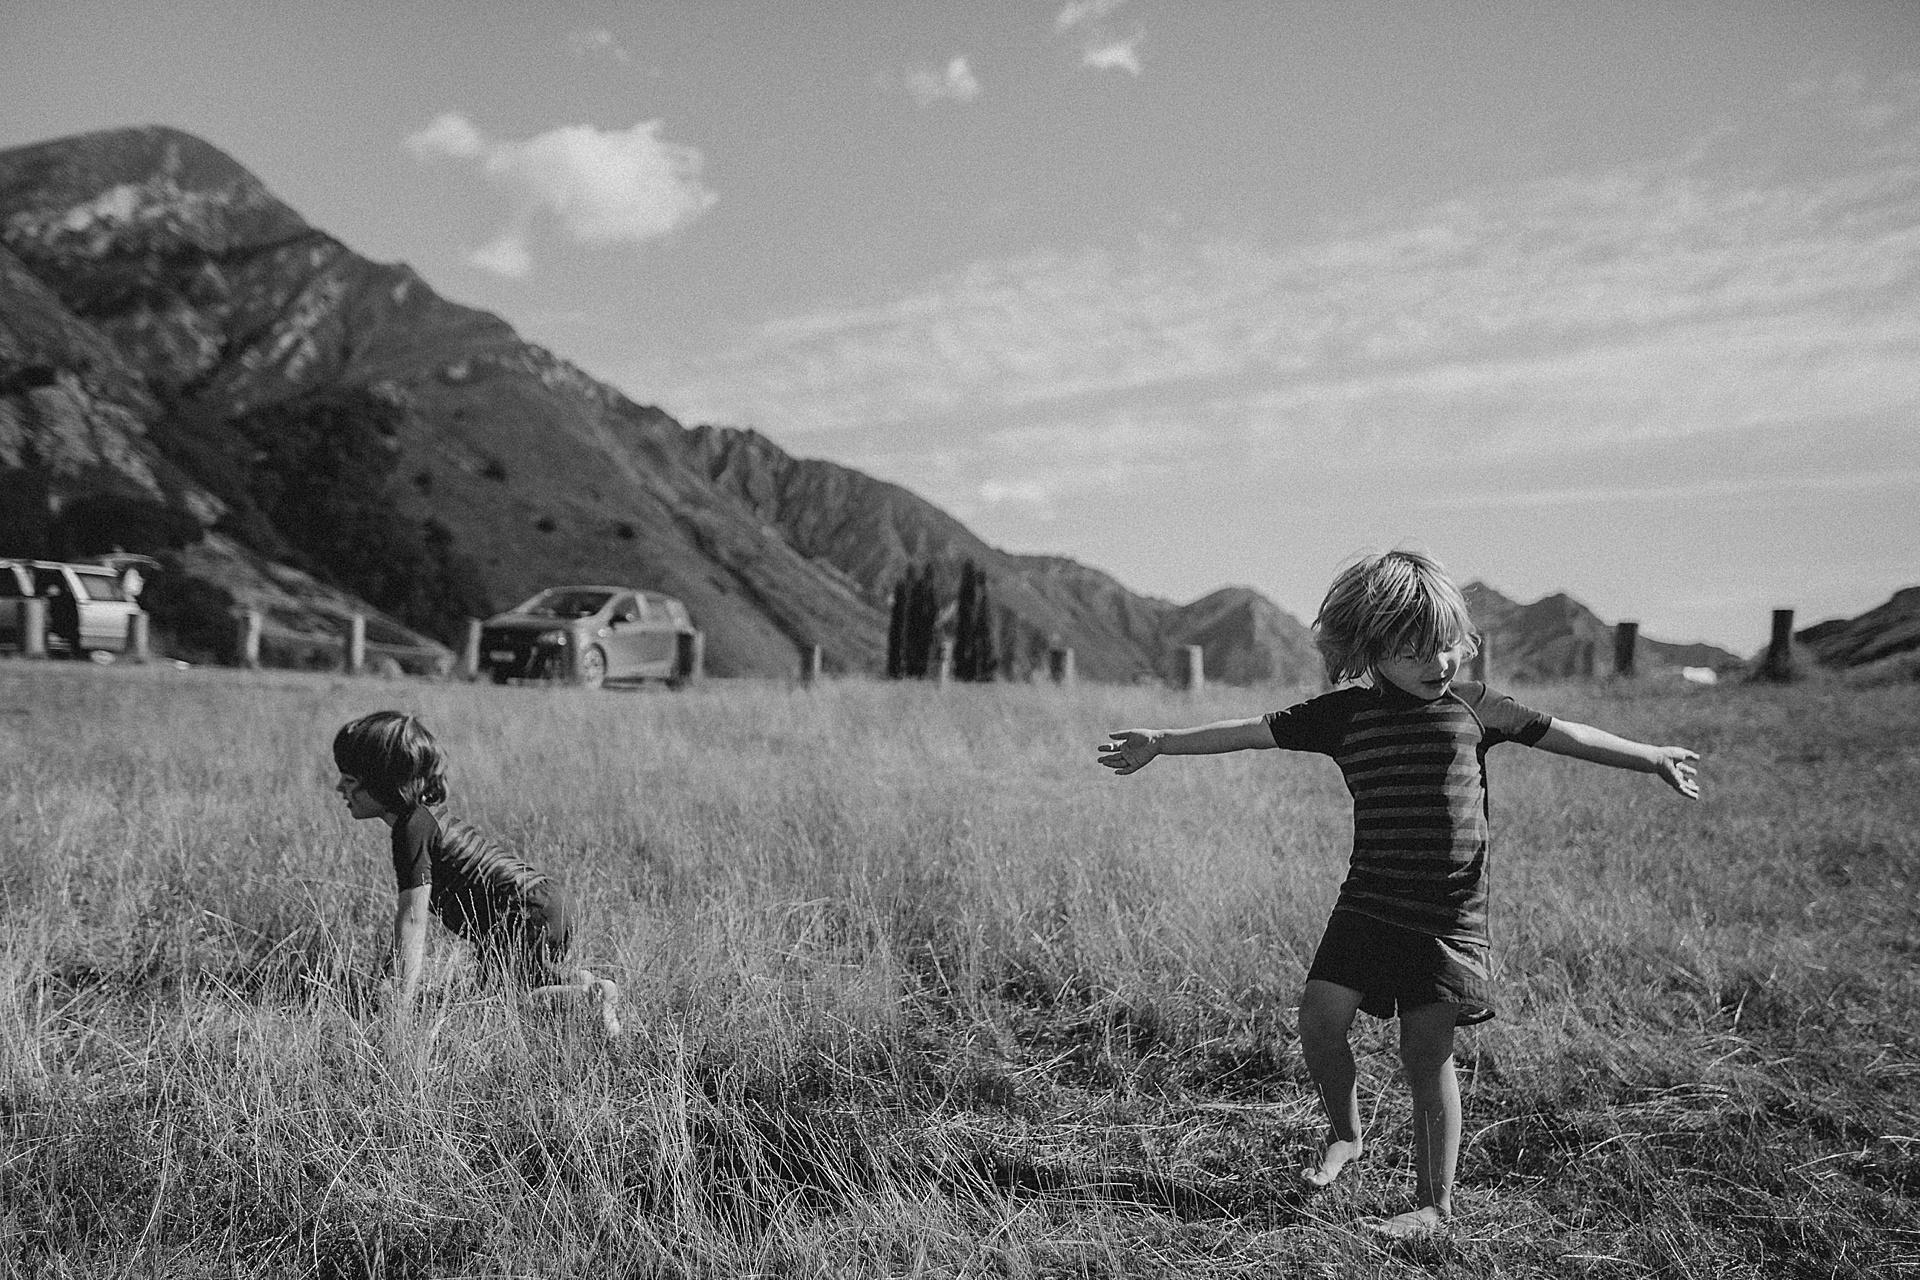 family-roadtrip-neuseeland-travelnewzealand-danielzube_0537.jpg